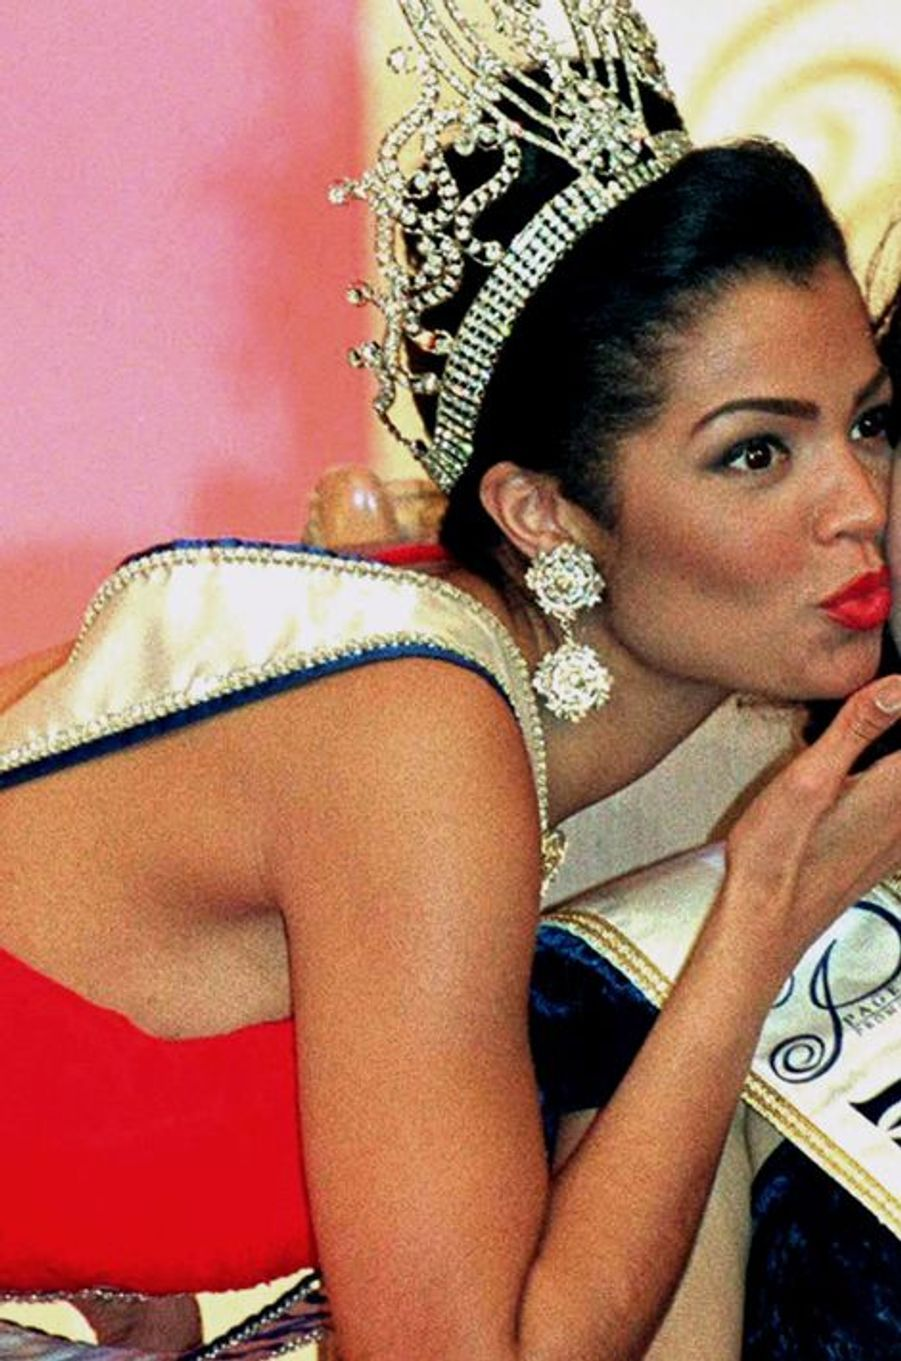 Chelsi Smith, MIss USA élue Miss Univers en 1995